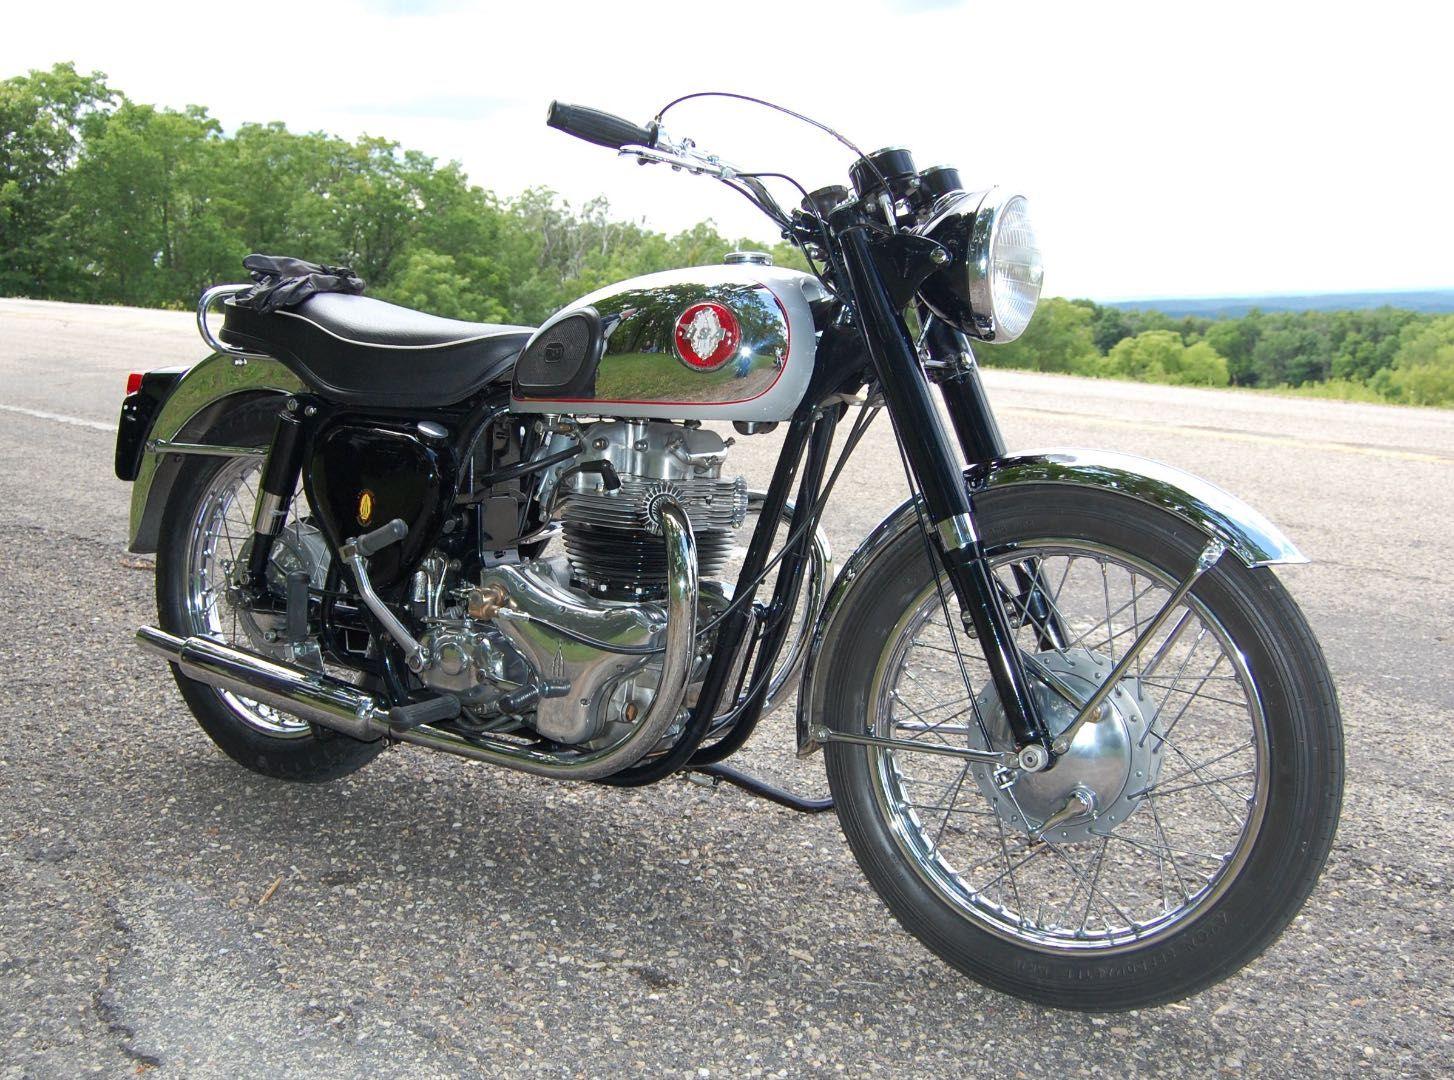 Bsa Motorcycles Revival India Giant Mahindra May Be The Answer 1959 Bsa A10 Bsa Motorcycle Motorcycle British Motorcycles